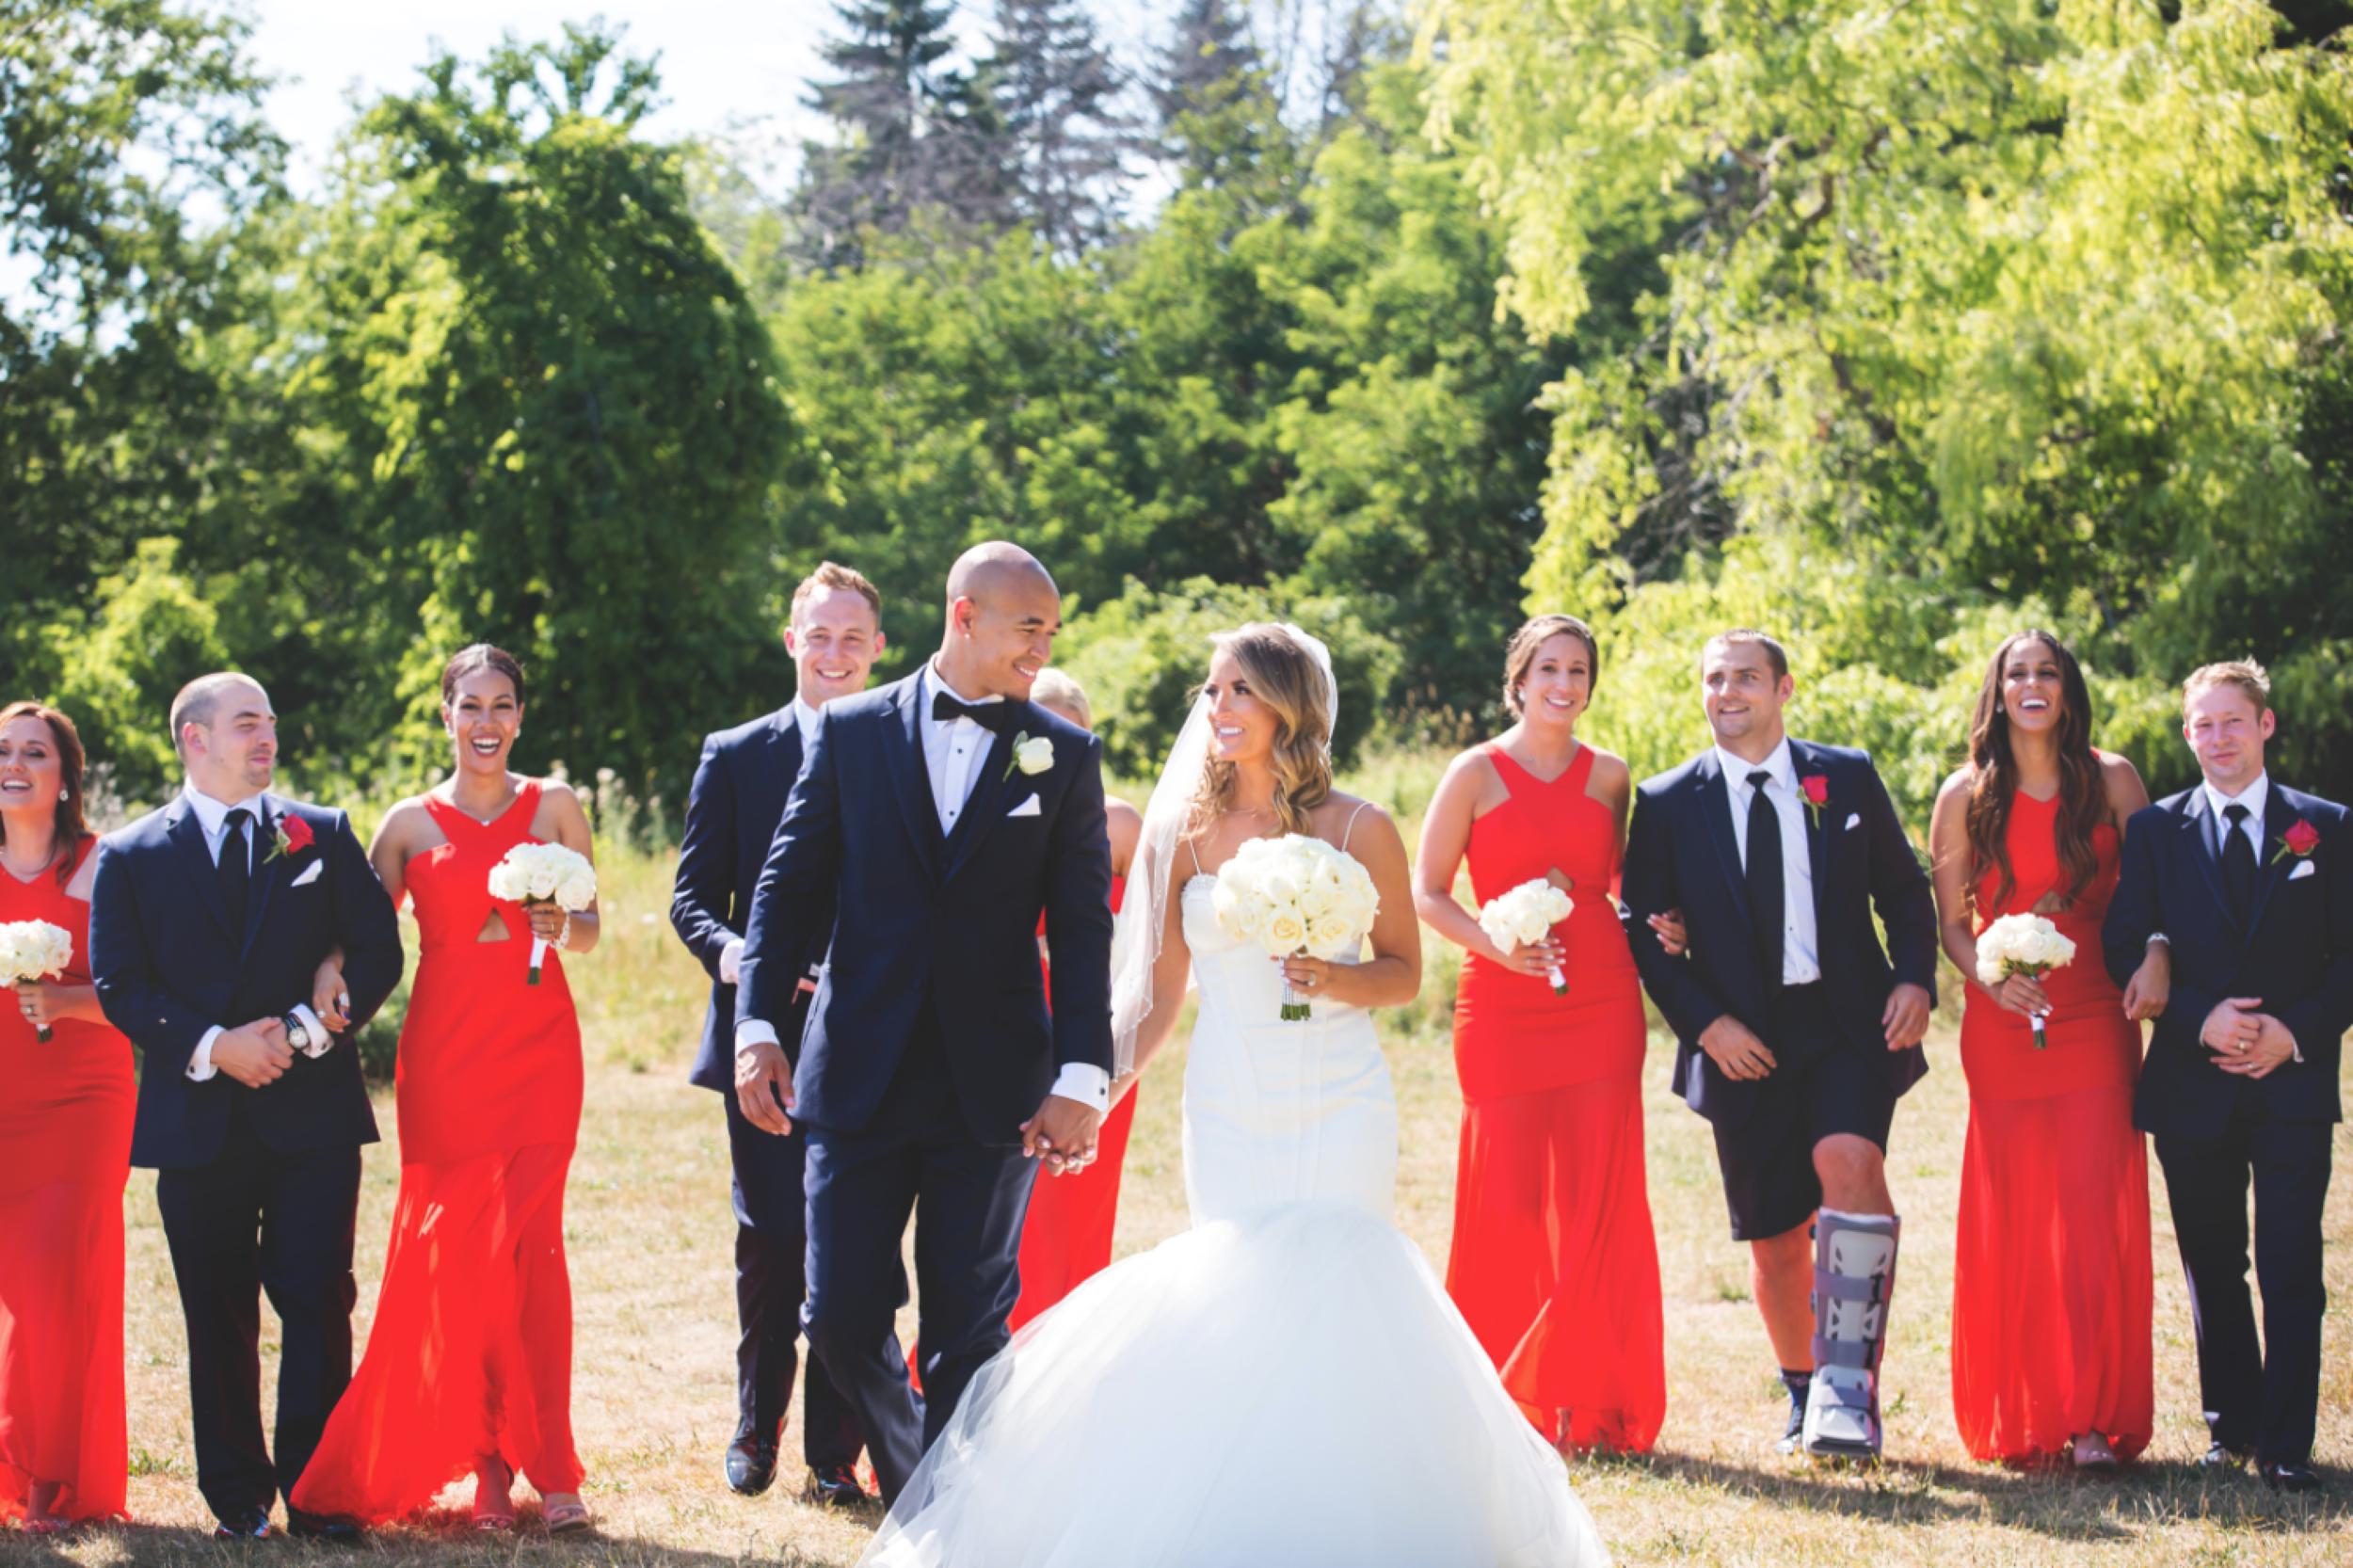 Wedding-Burlington-Convention-Center-Burlington-Oakville-Toronto-Hamilton-Niagara-Wedding-Photographer-Photography-Moments-by-Lauren-Photo-Image-31.png